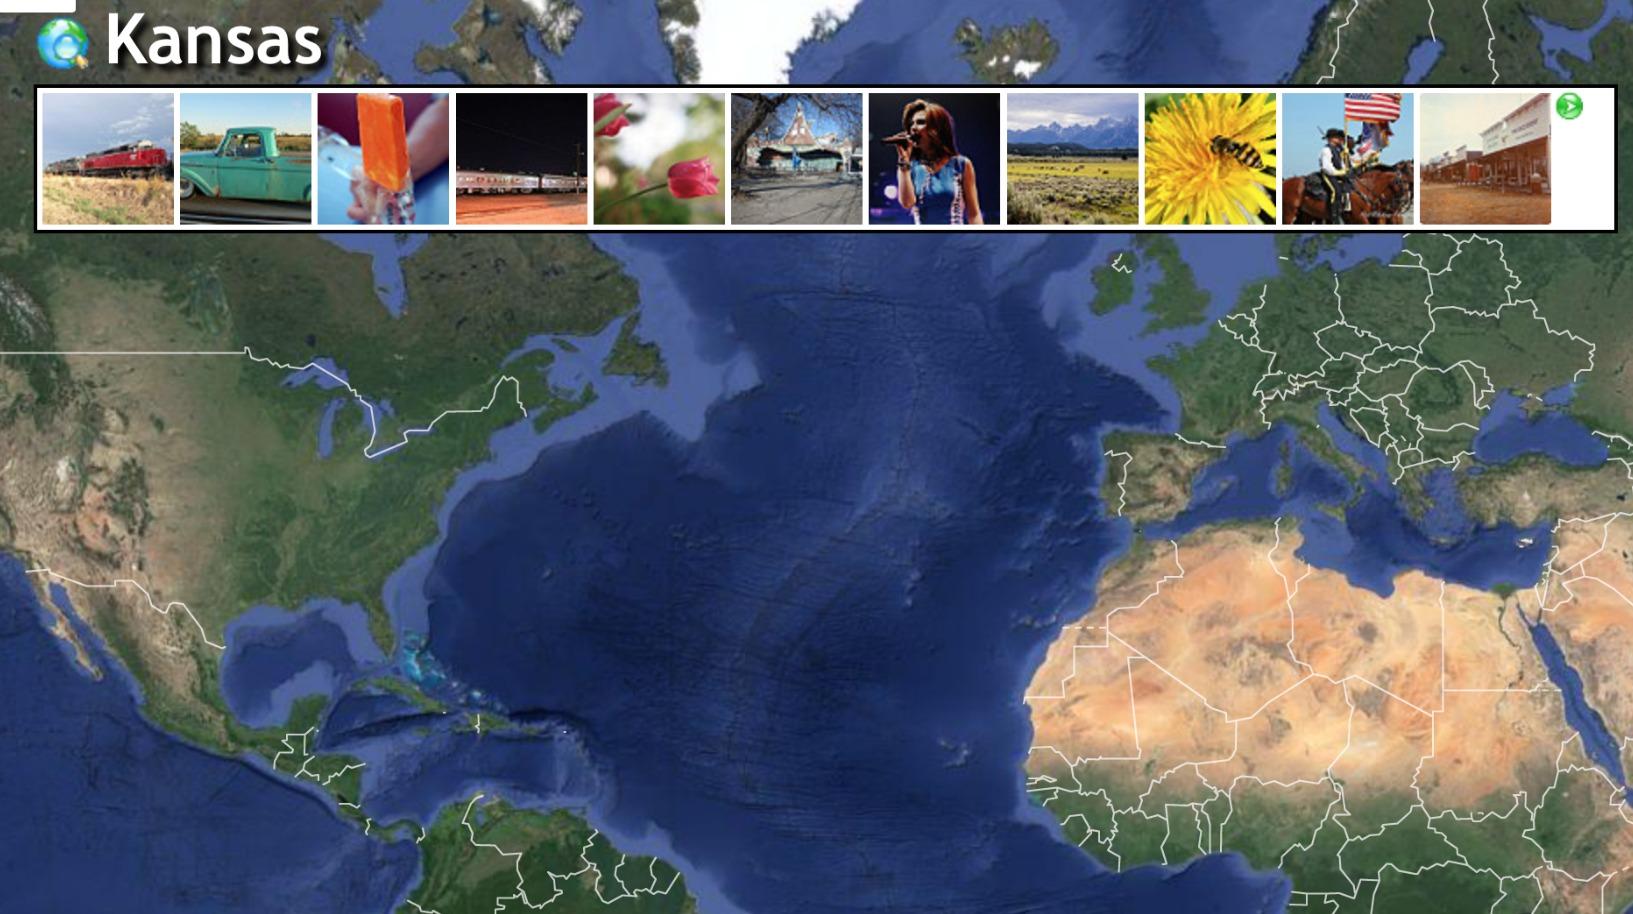 A screenshot of Earth Album